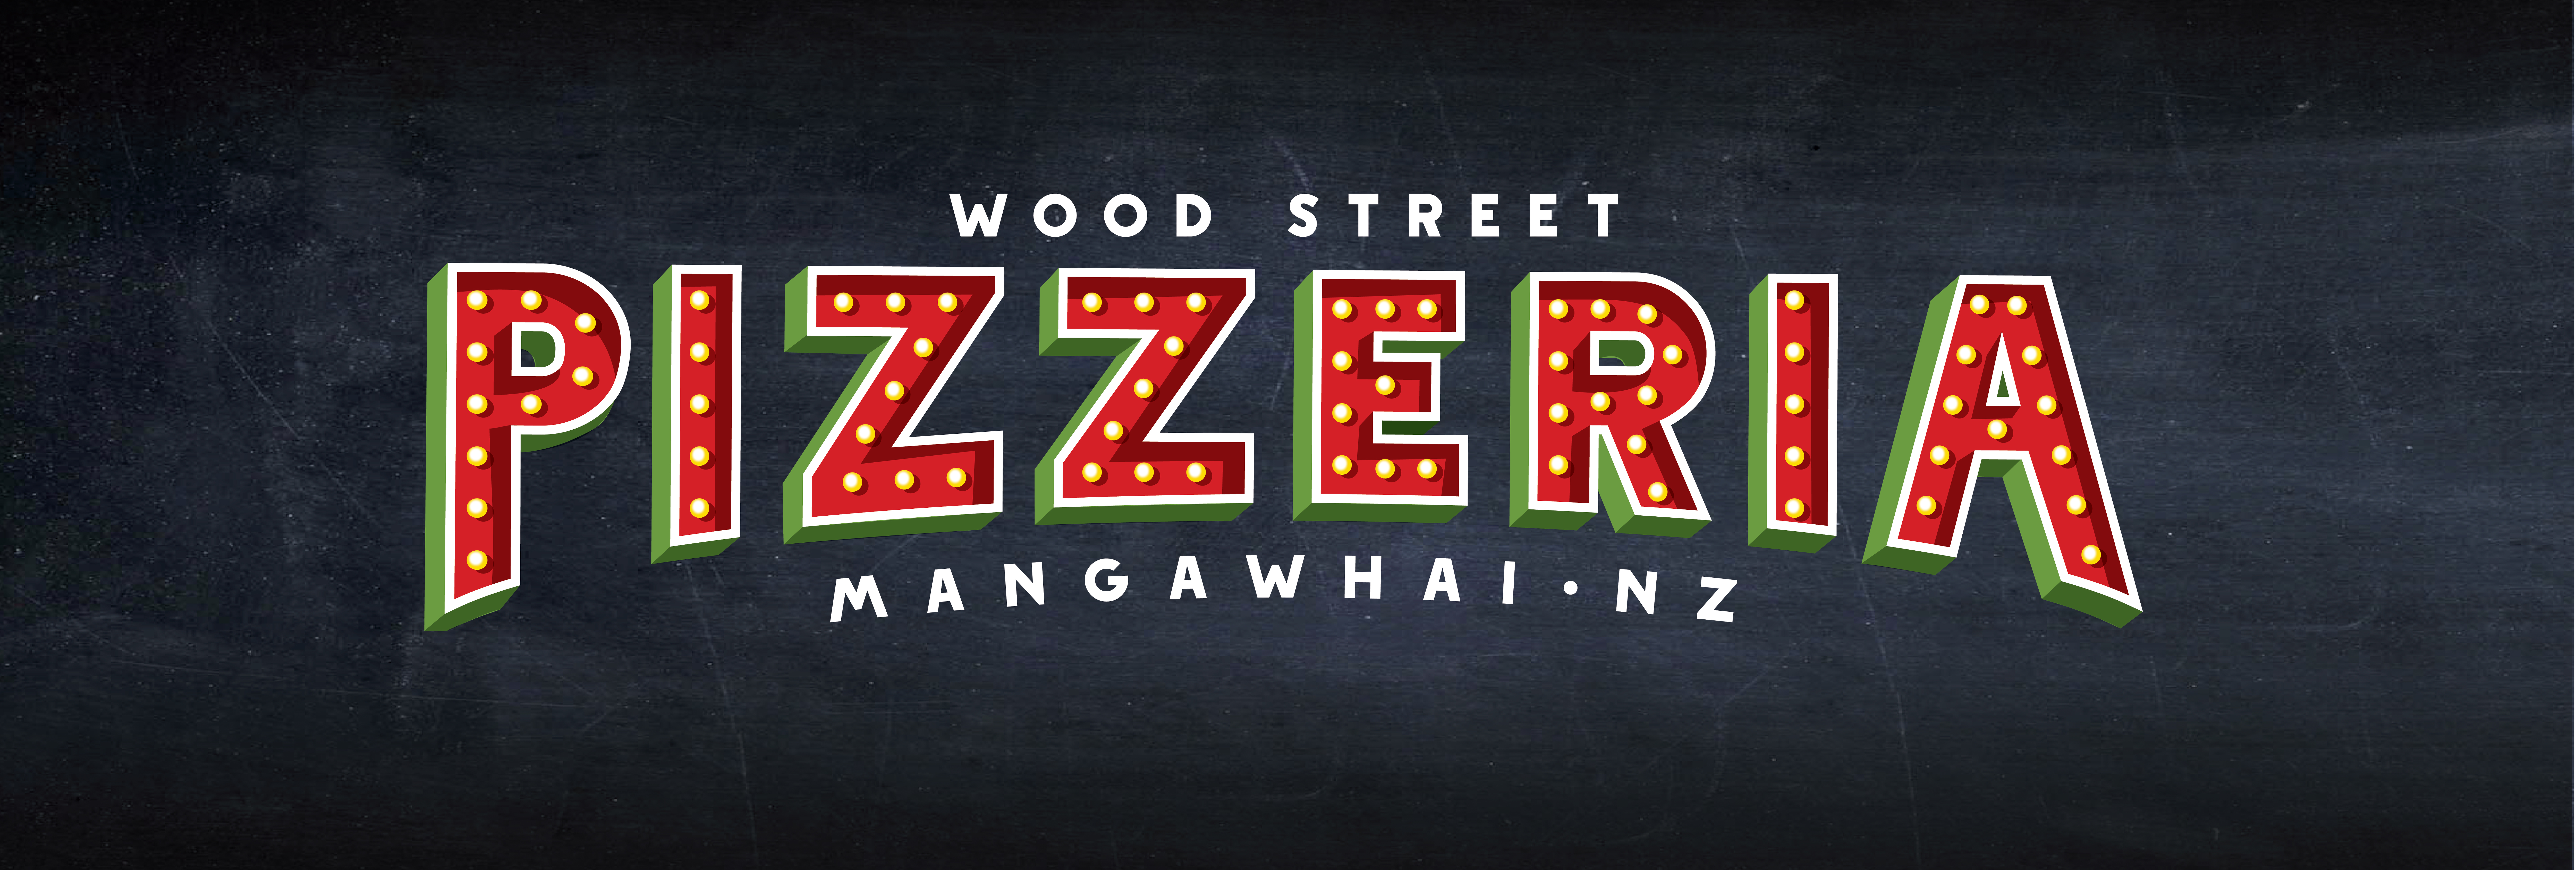 Wood Street Pizzeria